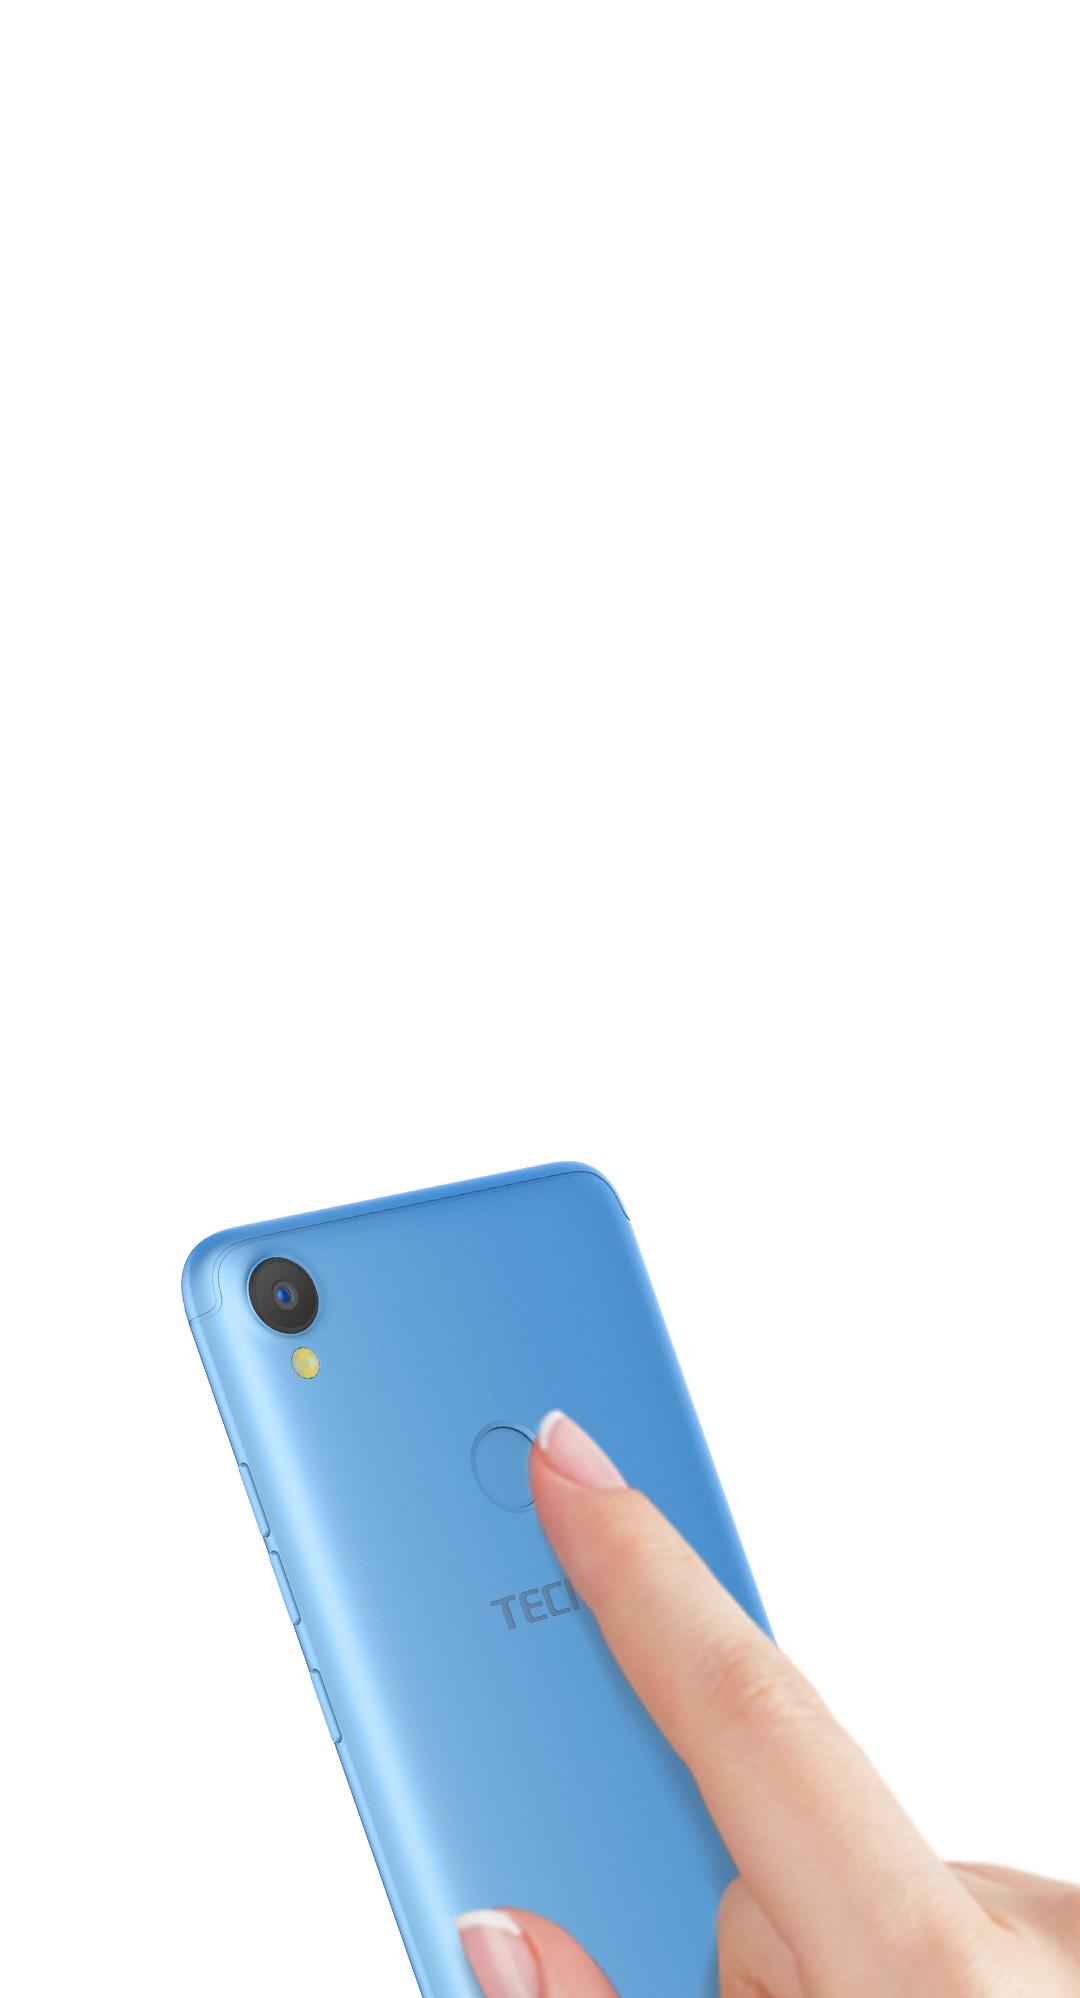 POP 1s Pro - TECNO Mobile